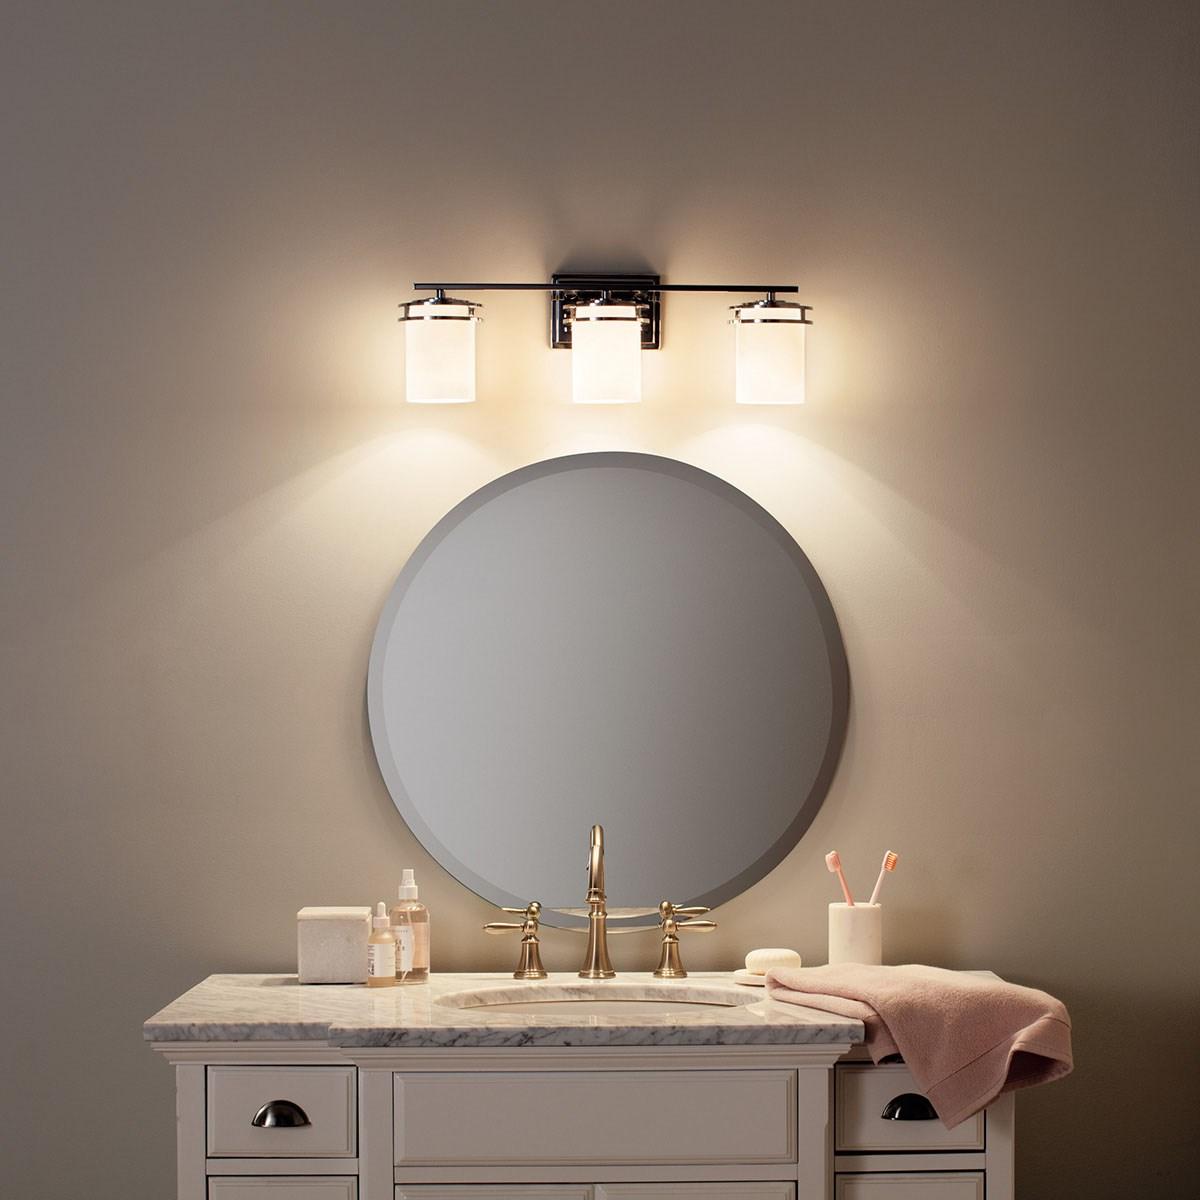 Hendrik 24 3 Light Vanity Light With Satin Etched Cased Opal Glass Chrome Kichler Lighting